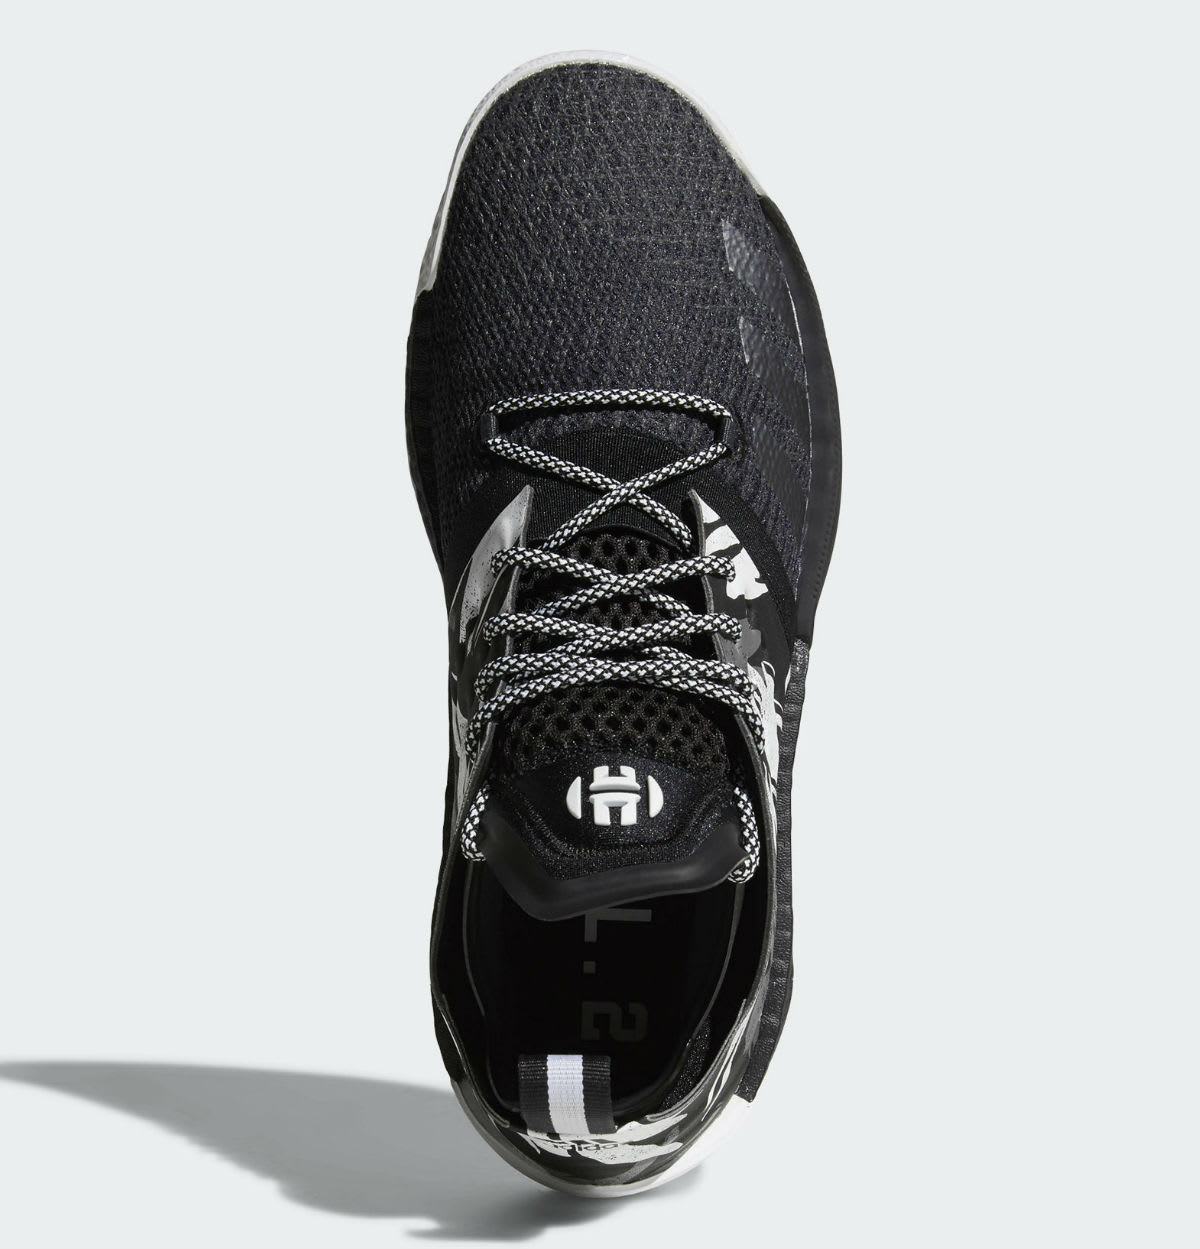 Adidas Harden Vol. 2 Traffic Jam Release Date AH2217 Top